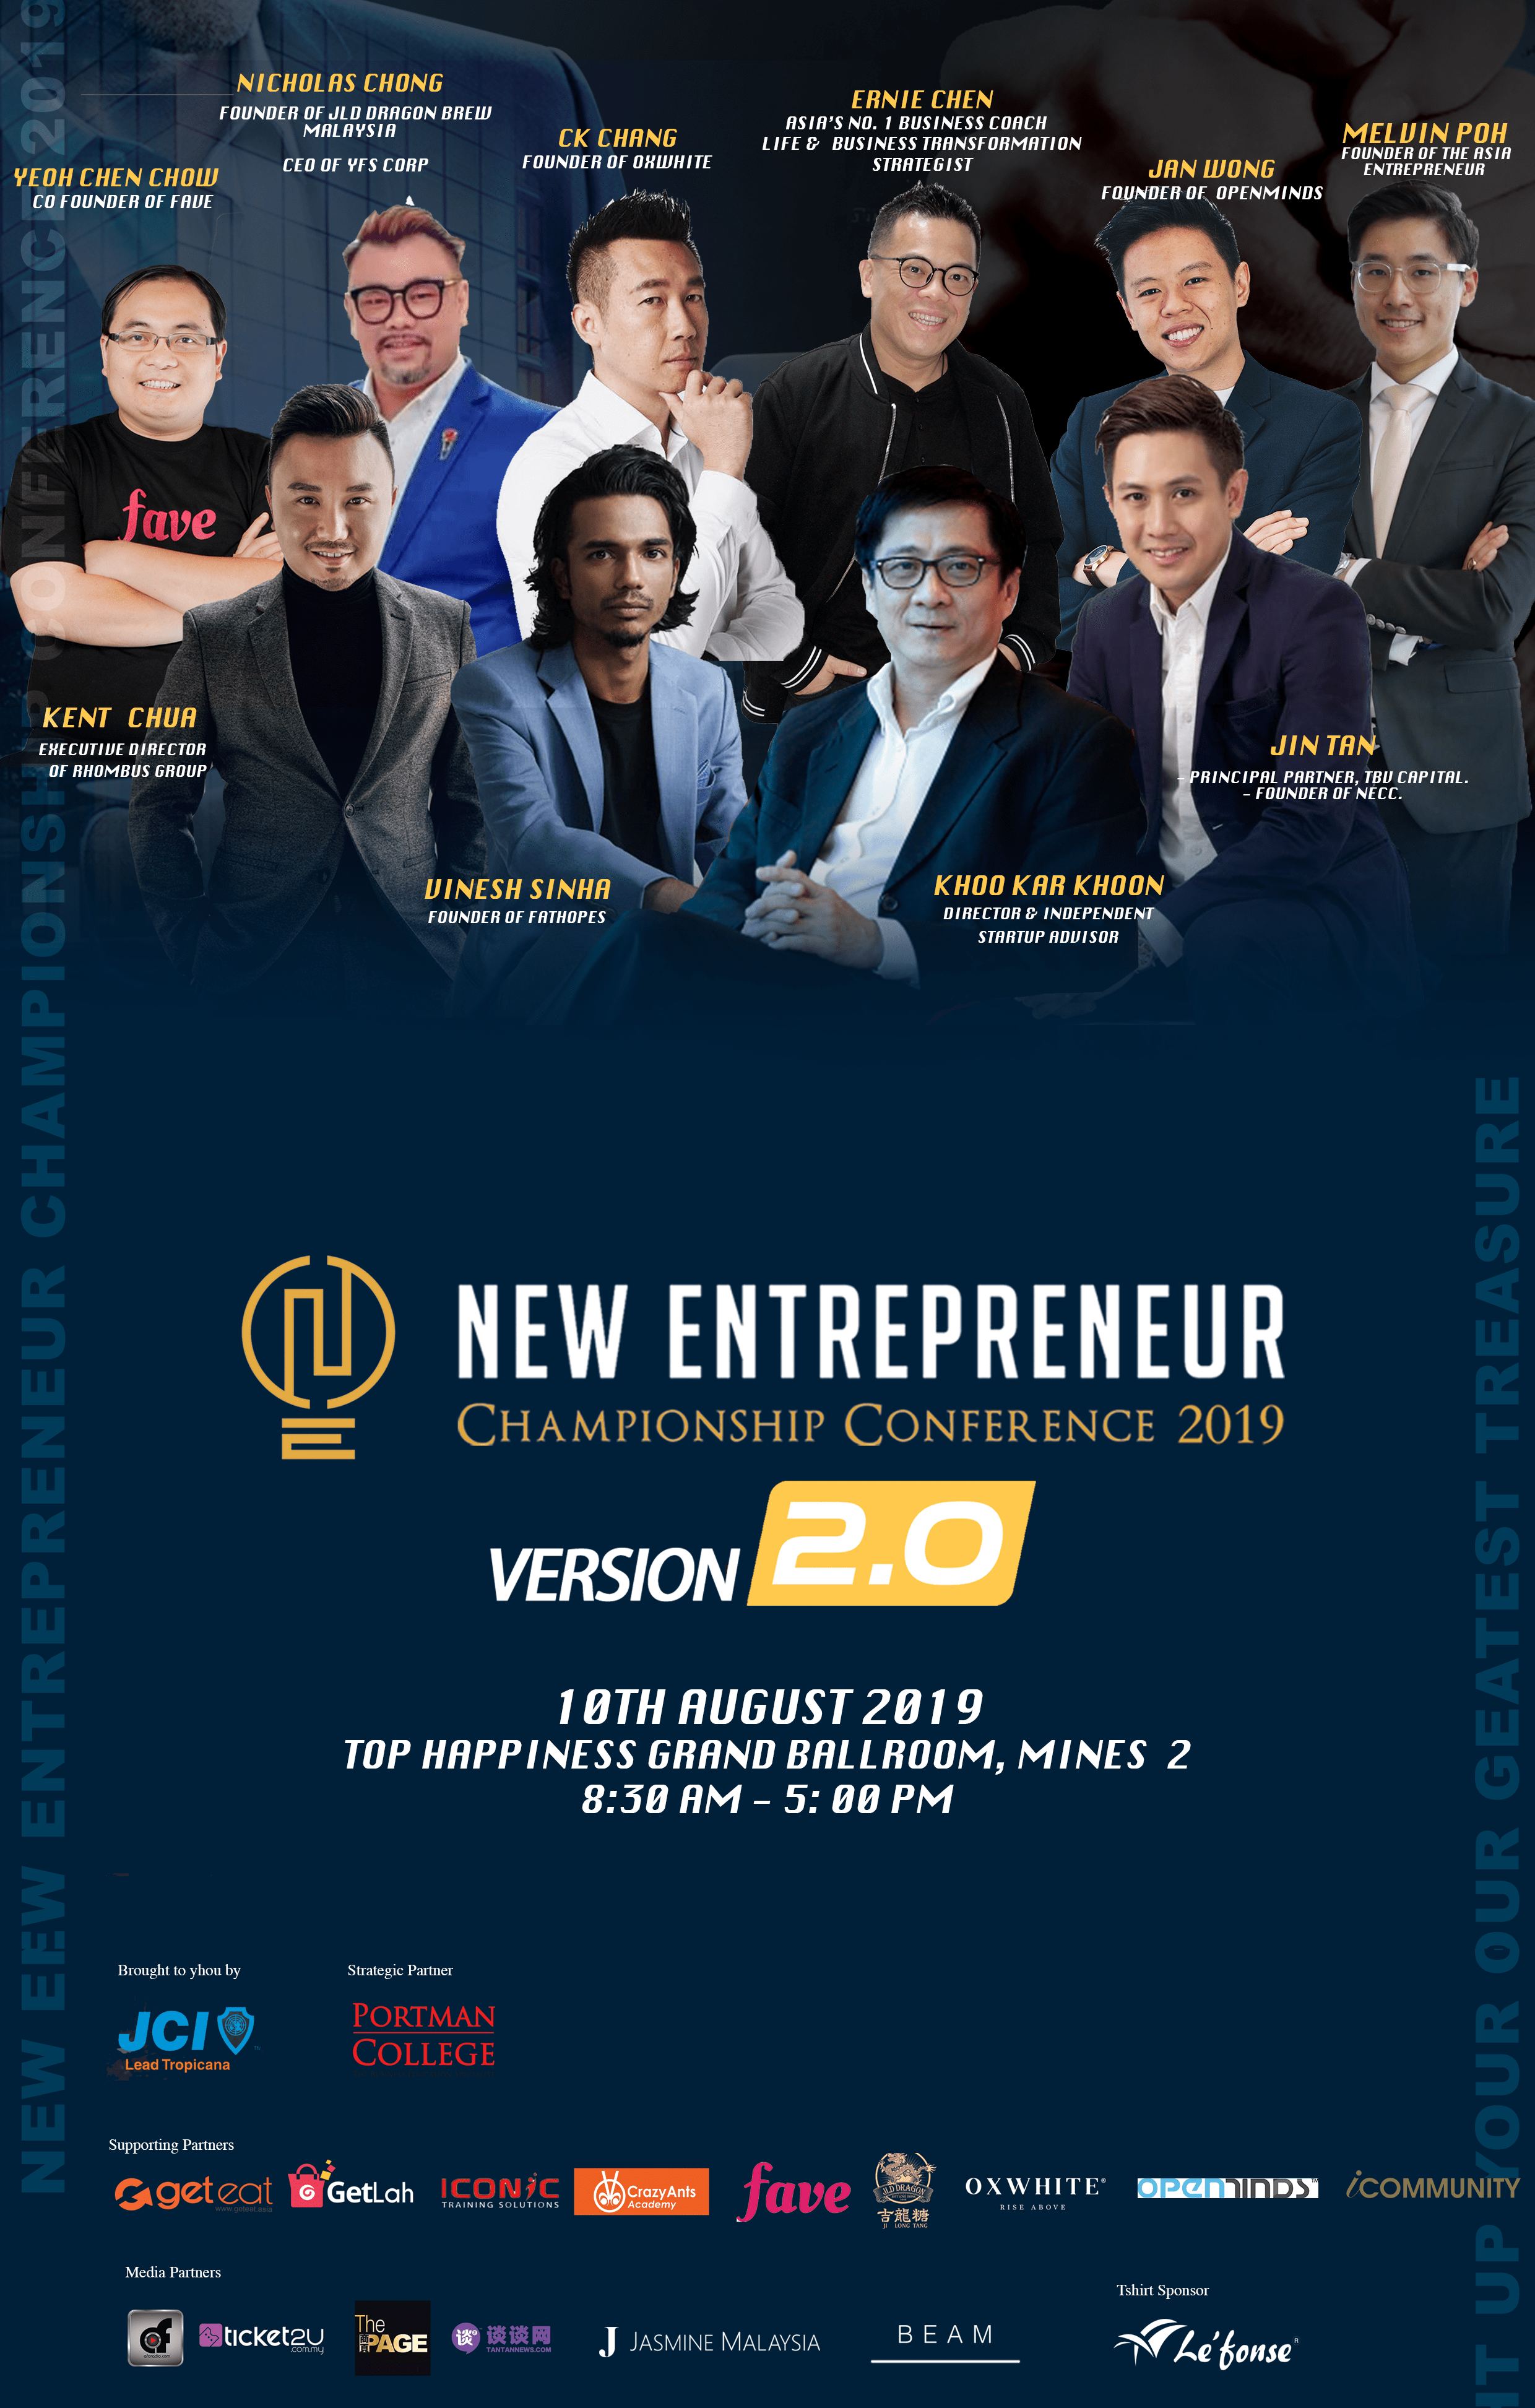 New Entrepreneur Championship Conference 2019 – iCOMMUNITY